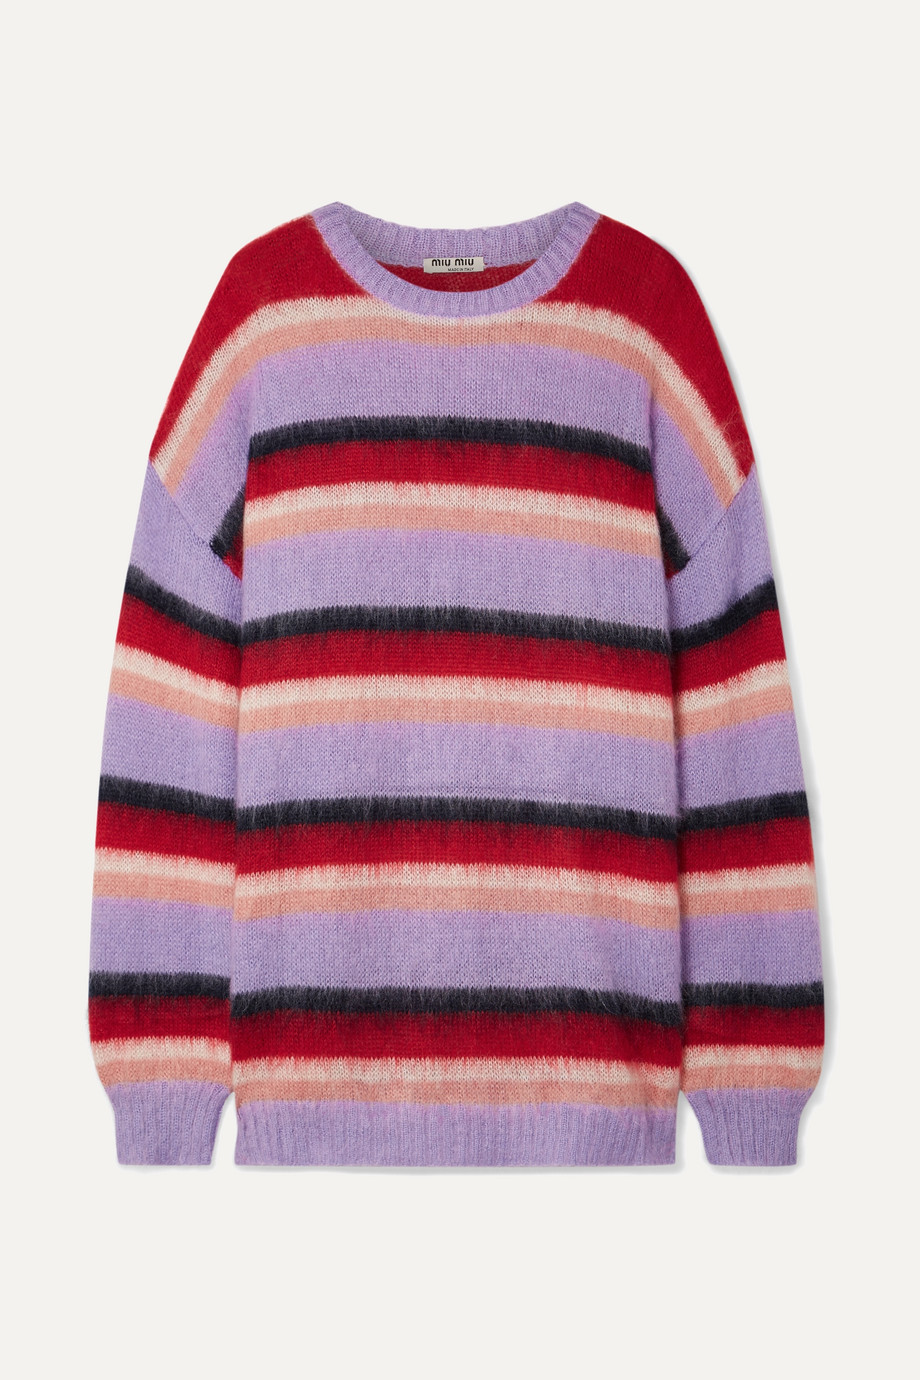 Miu Miu Gestreifter Oversized-Pullover aus einer Mohairmischung